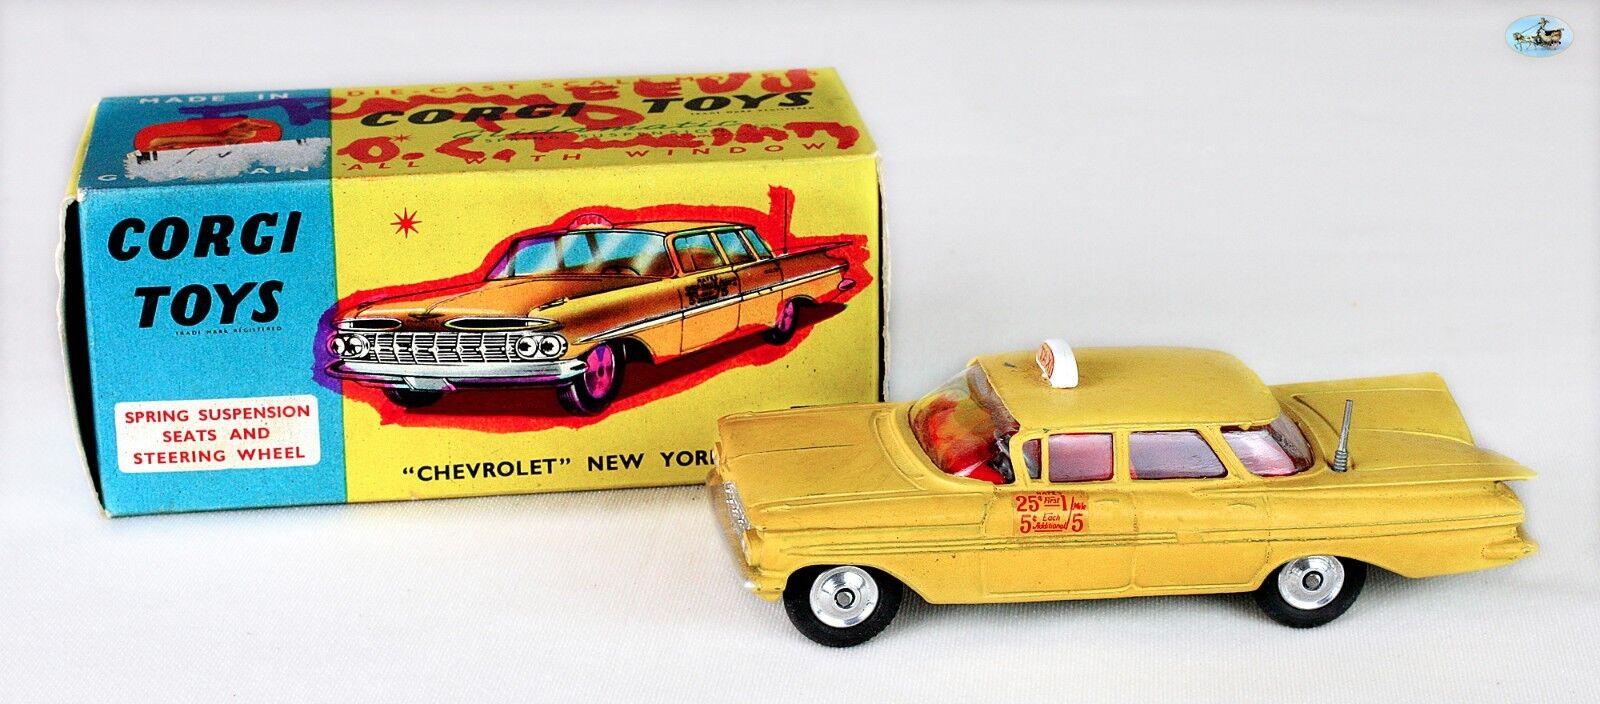 Awesome Corji Toys 1959 Chevrolet New York Taxi Gelb Cab Toy Car